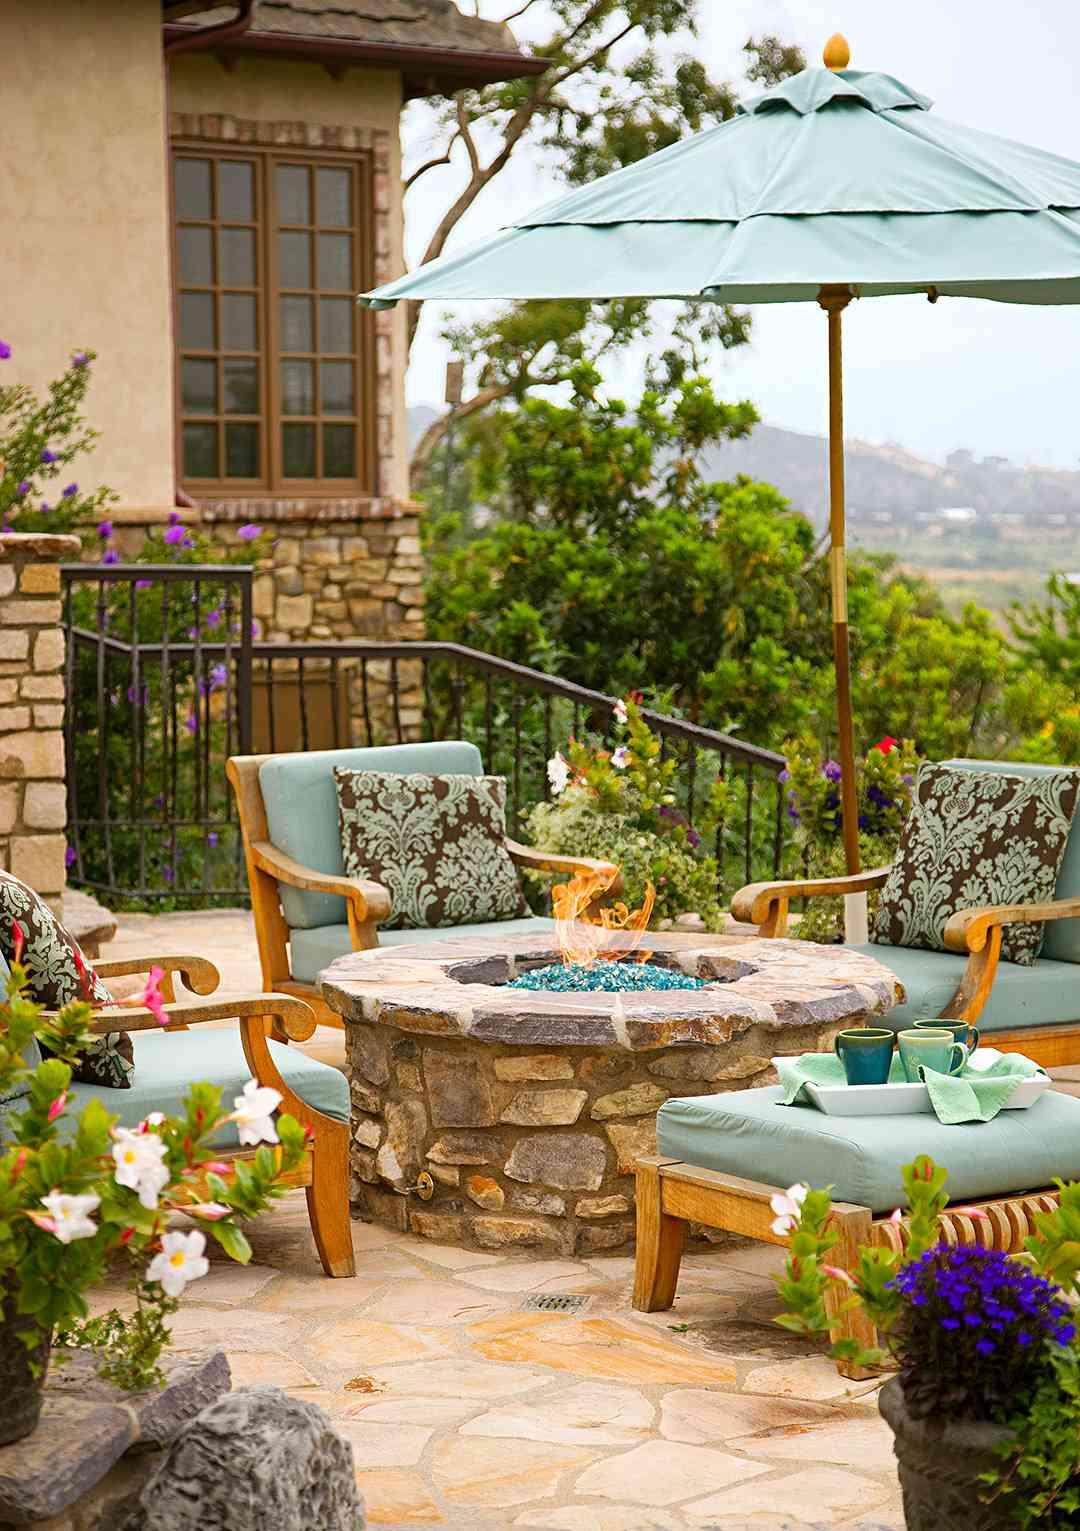 9 Budget-Friendly Backyard Ideas   Better Homes & Gardens on Outdoor Patio Ideas On A Budget id=87028